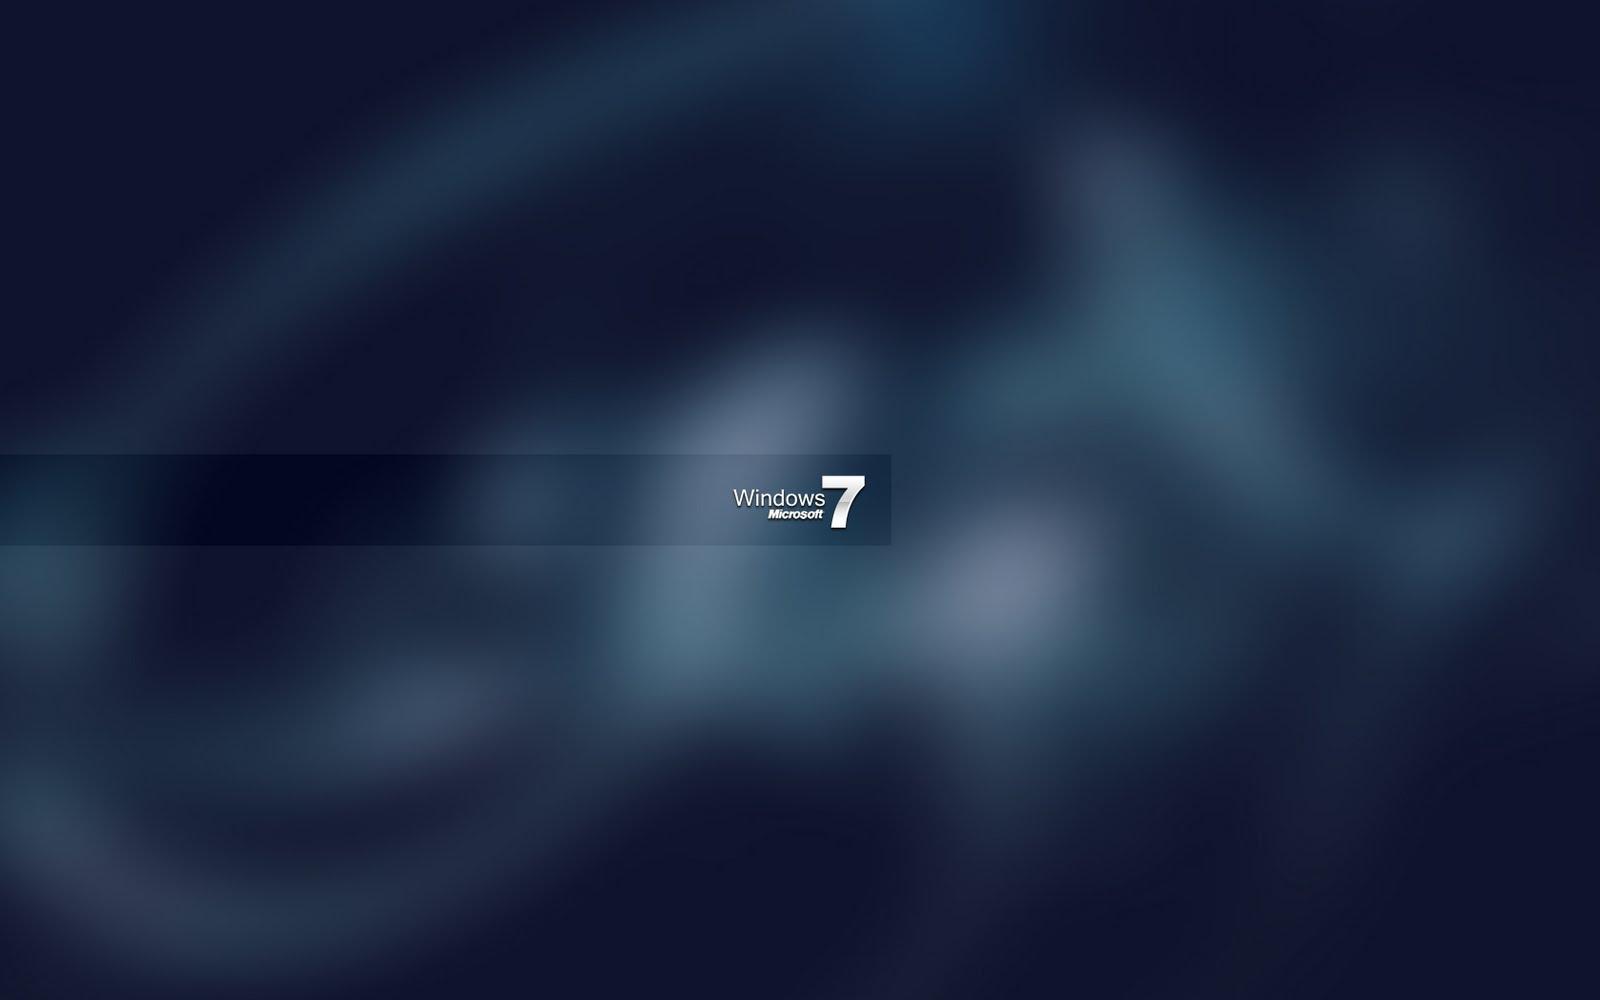 http://2.bp.blogspot.com/-svEapyAwVk4/Thhq3tzswPI/AAAAAAAABFM/5u4oOpRWp7A/s1600/Windows-7-Clean.jpg